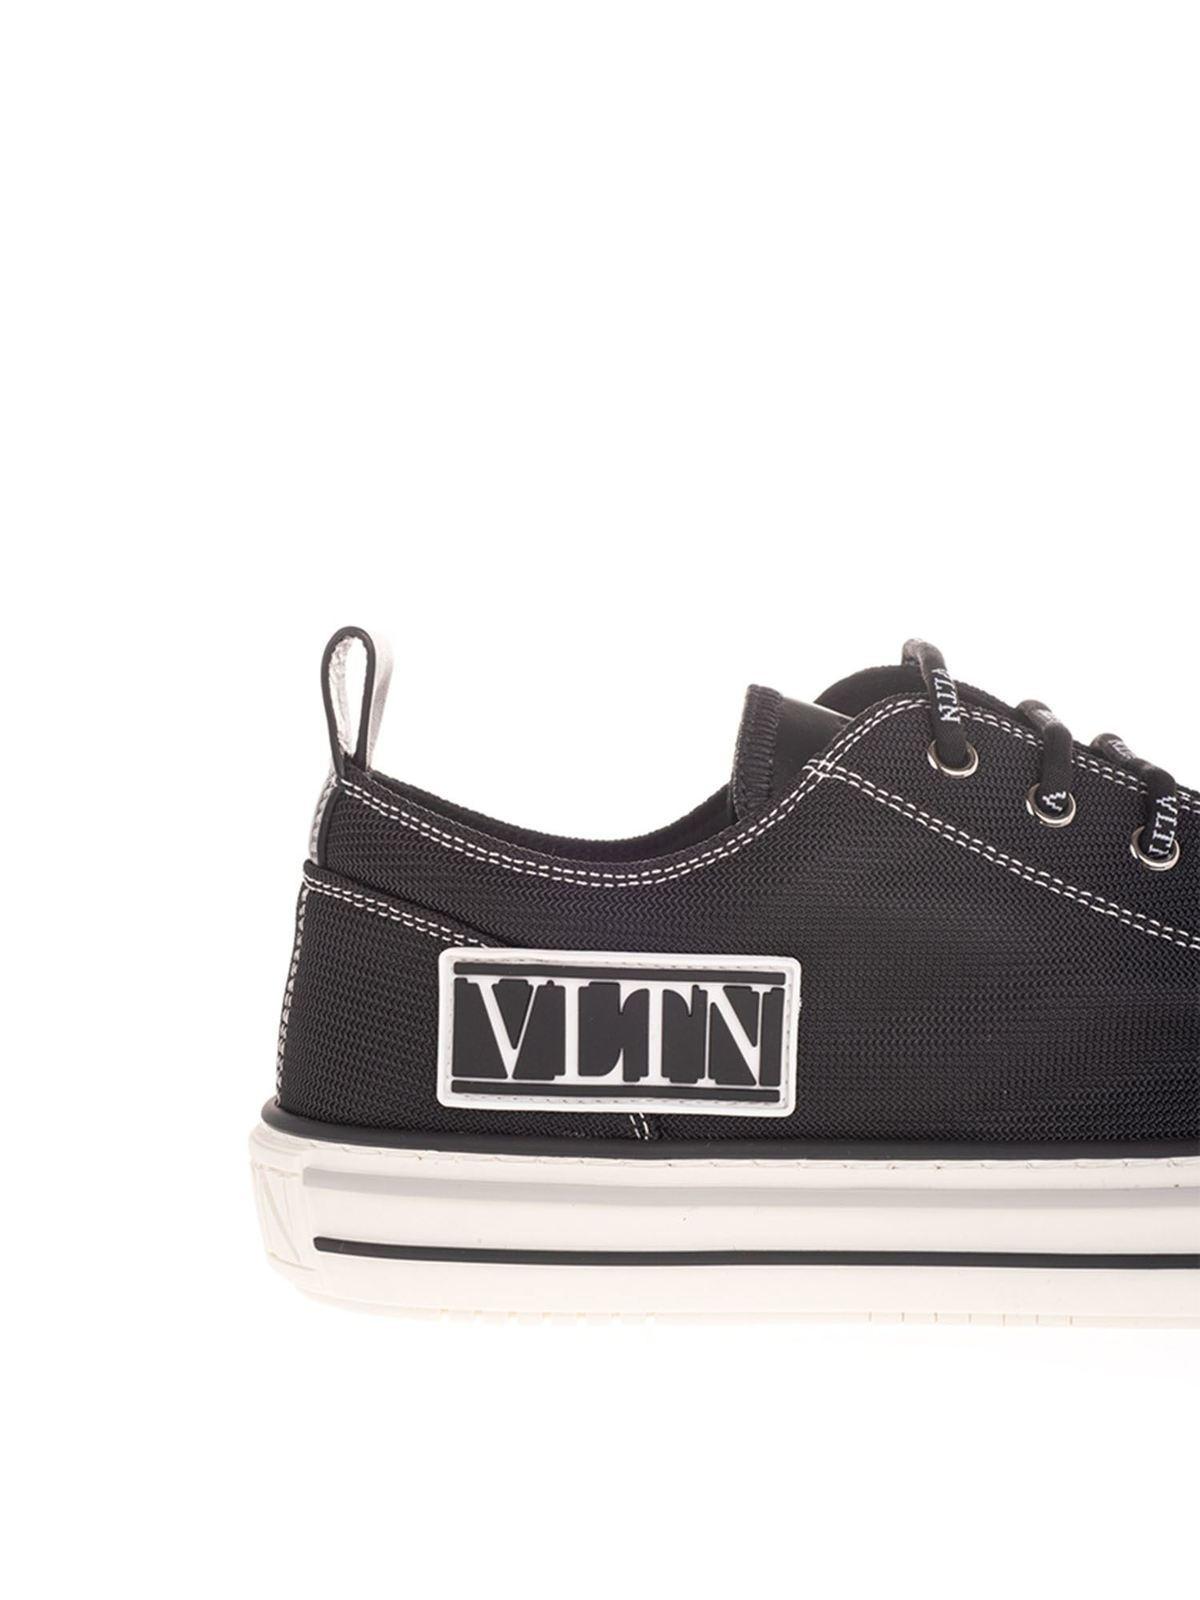 Trainers Valentino Garavani - VLTN sneakers in black - UY2S0D57MBU0NO